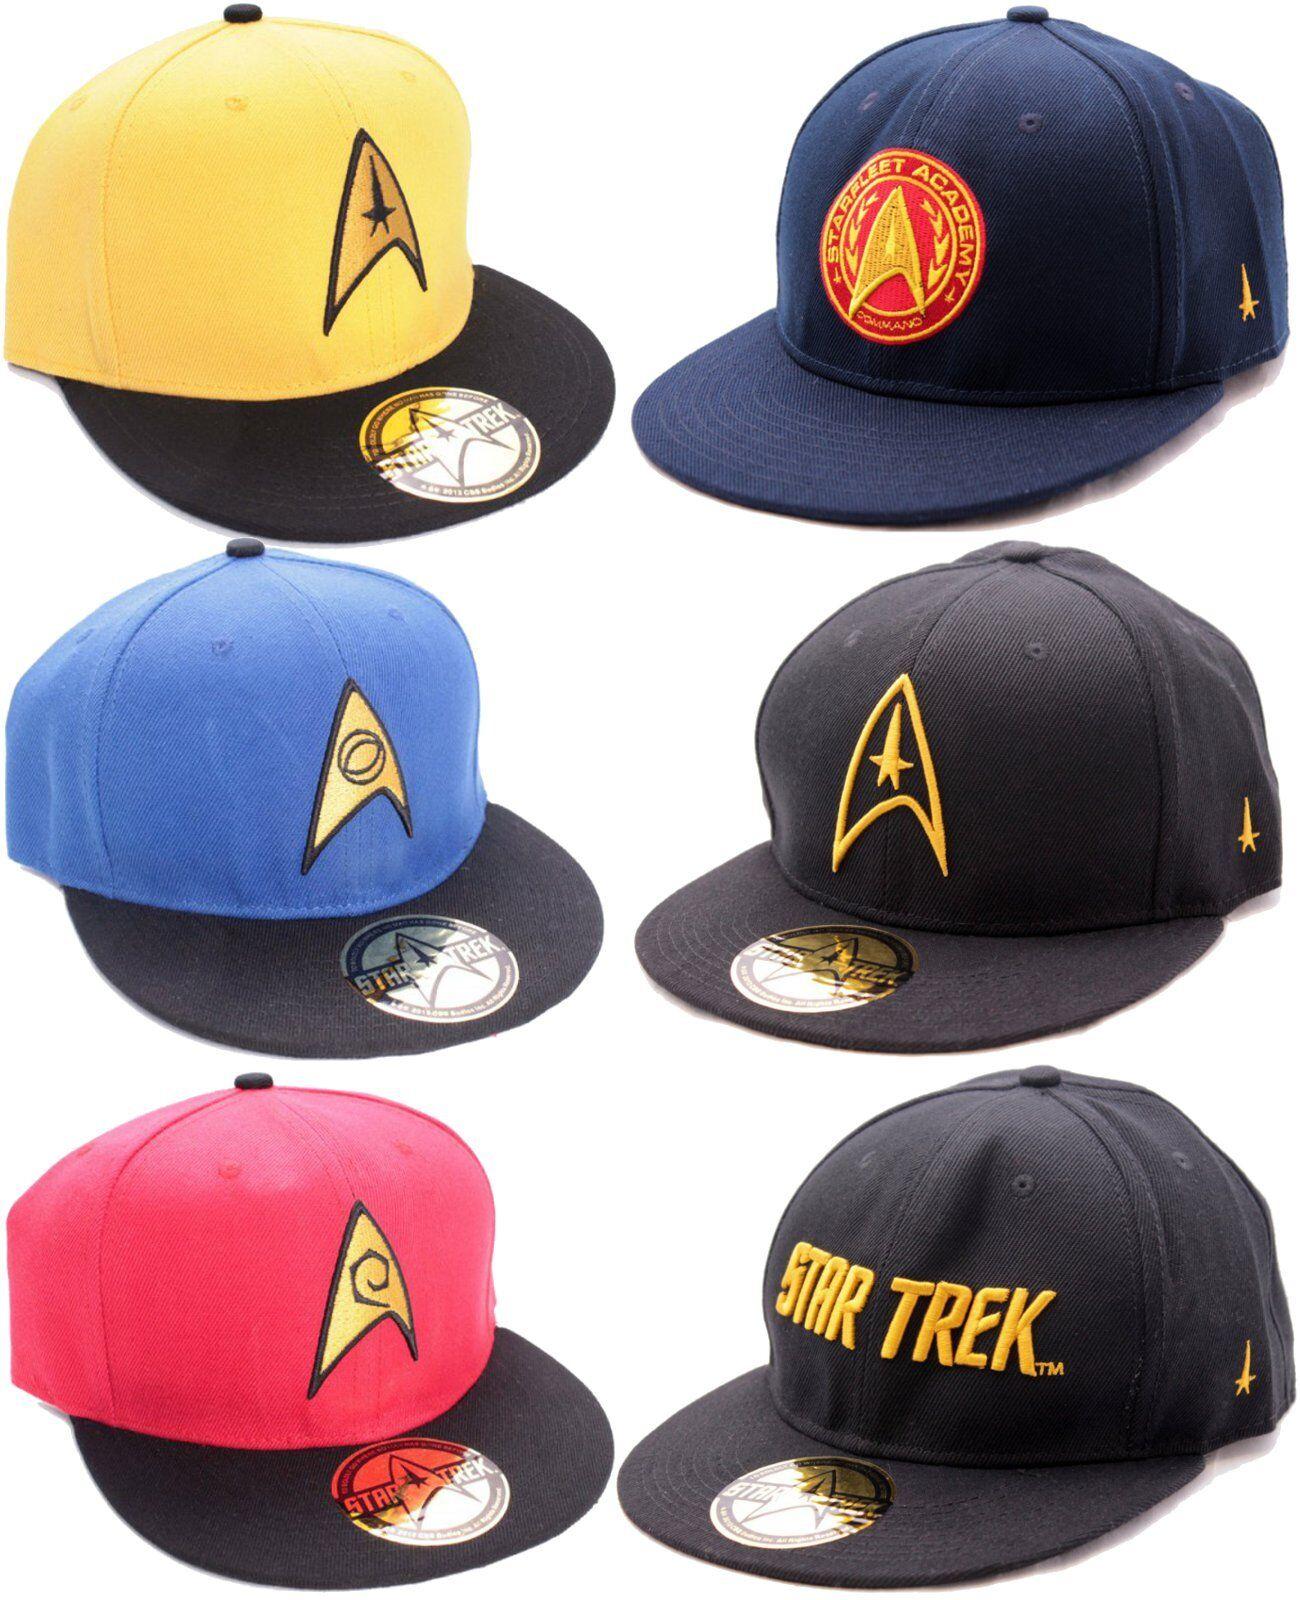 Star Trek Original Scotty Kirk Spock Crew Baseball Cap Kappe Mütze Hut Snapback